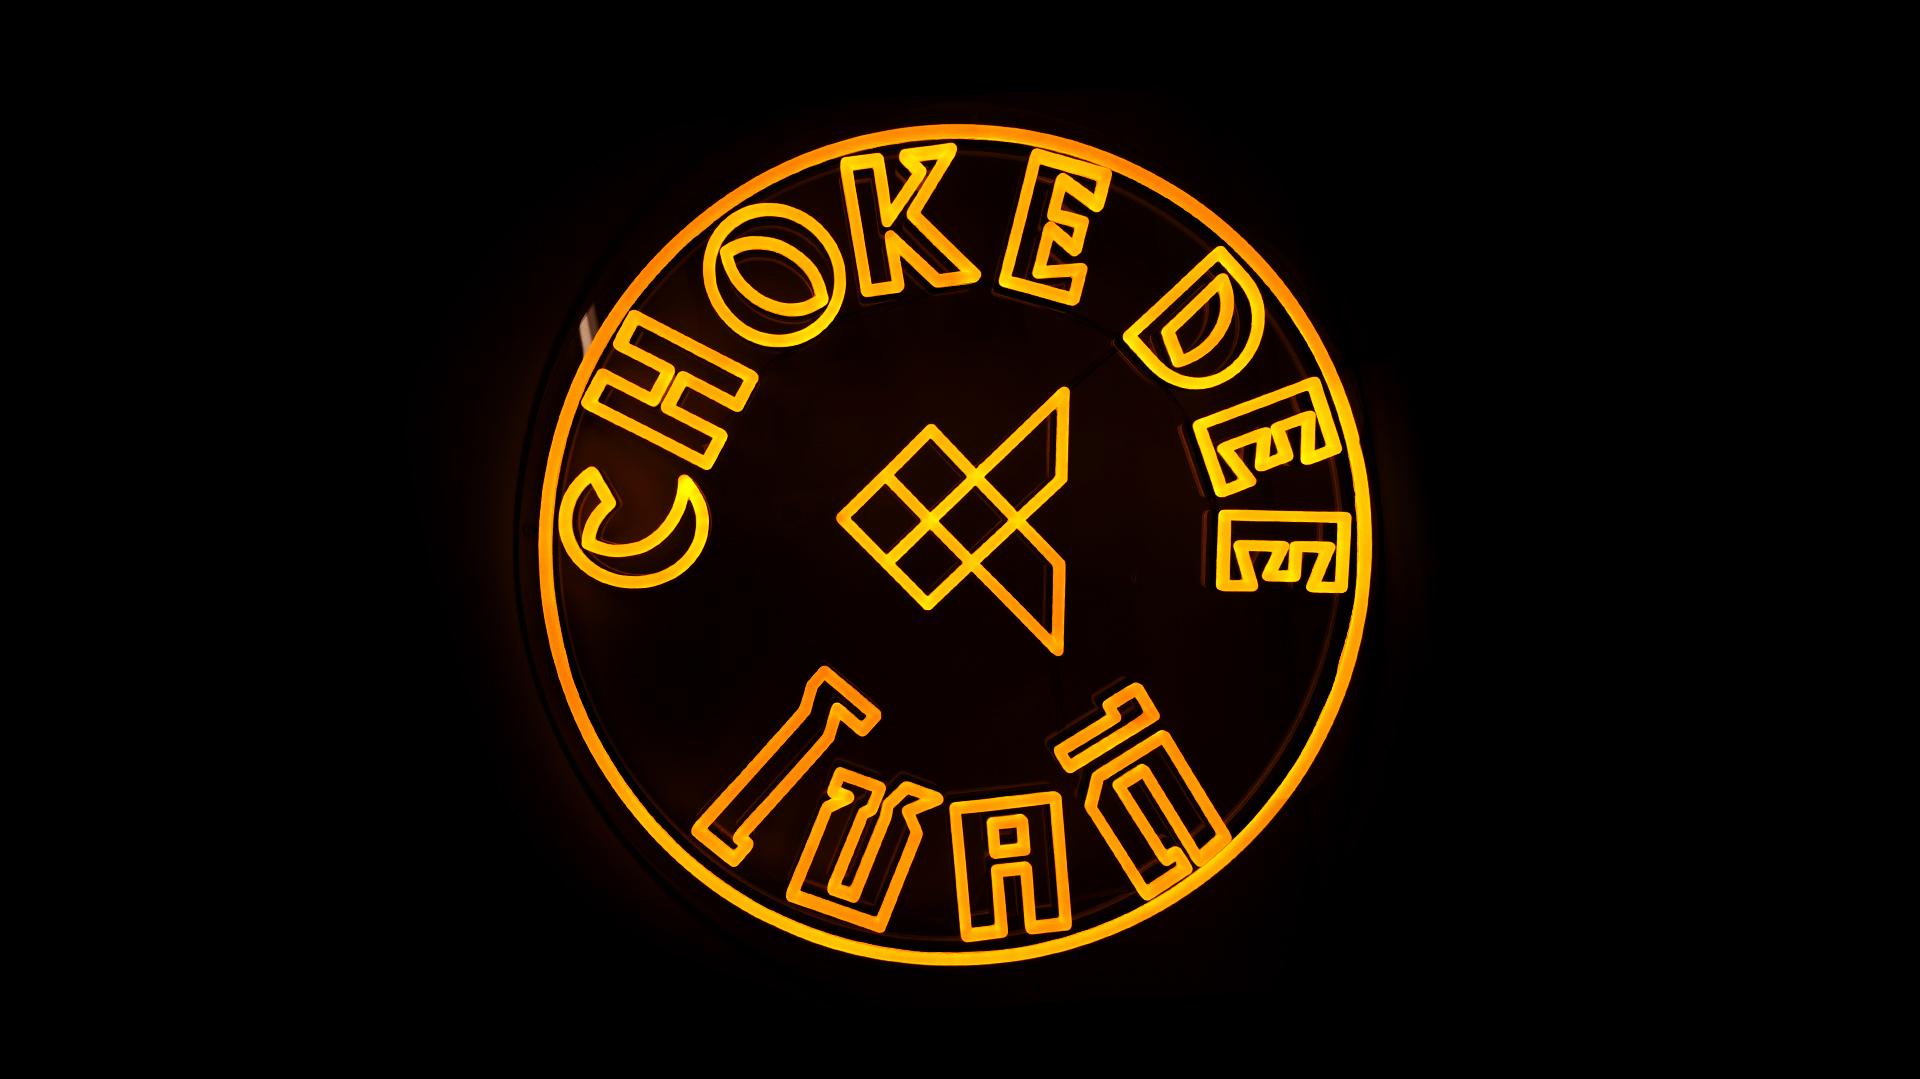 Choke Dee restaurant neon sign